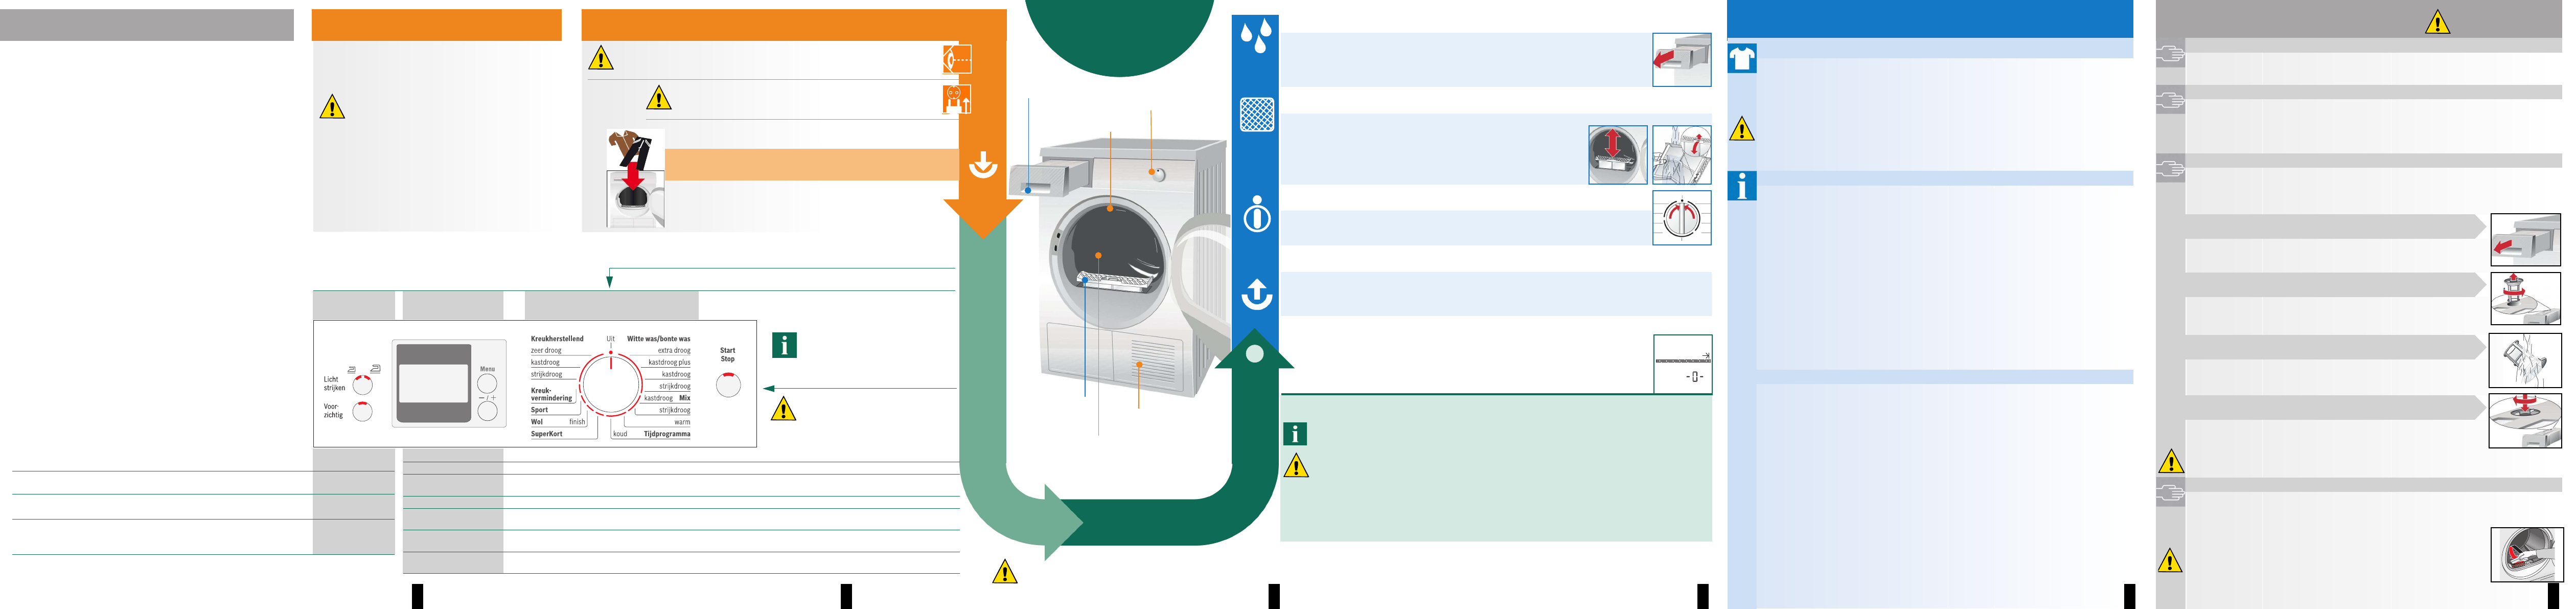 Bosch wasdroger ecologixx 7 storing